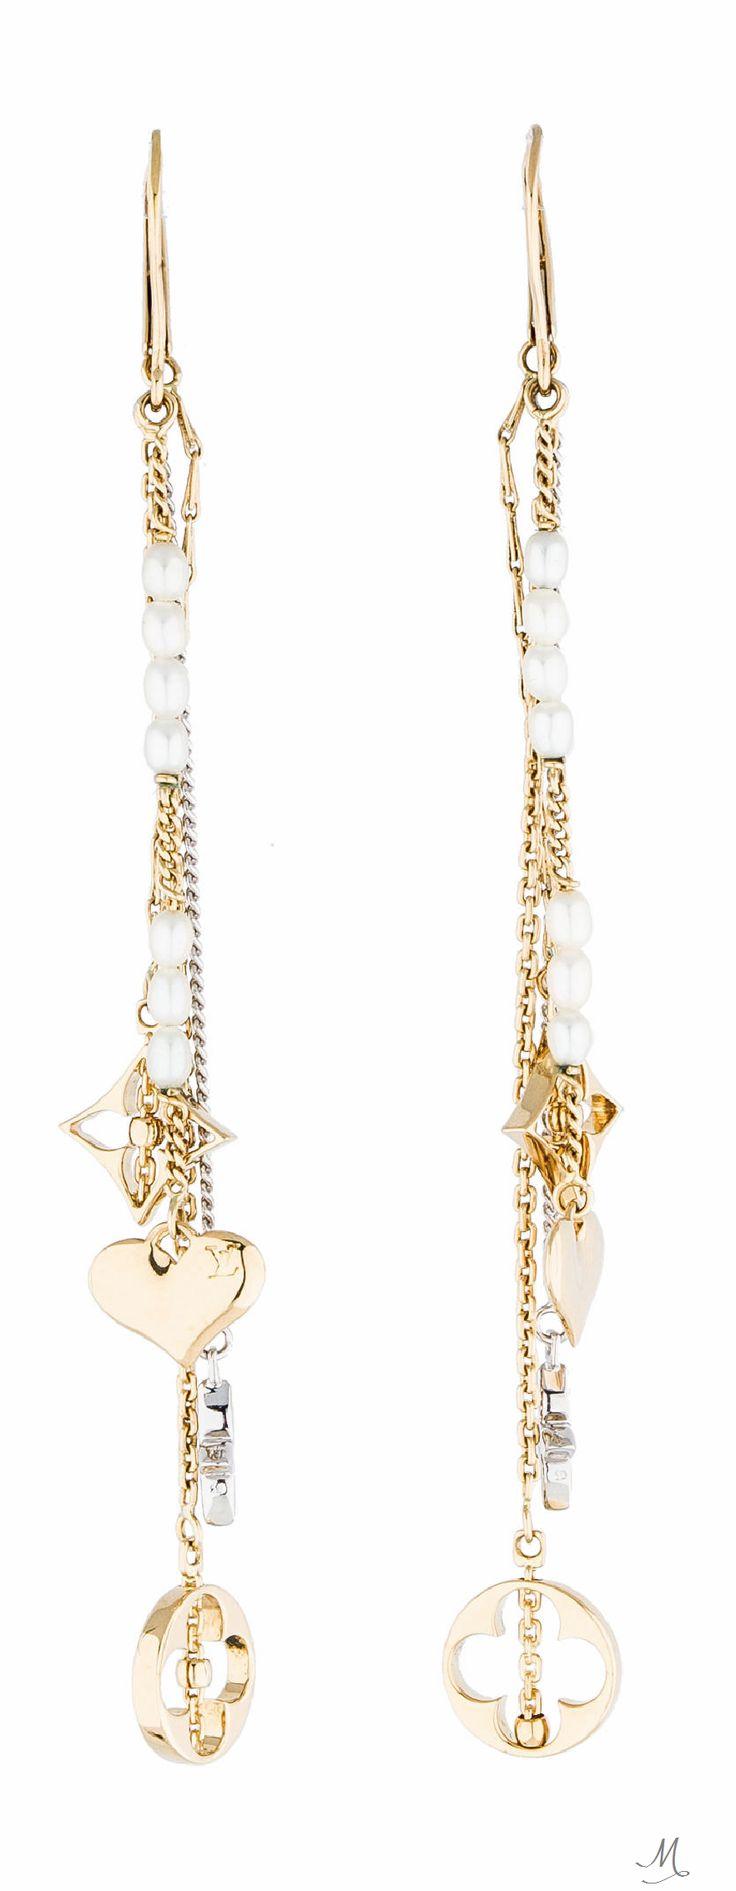 Louis Vuitton Monogram Pearl Drop Earrings